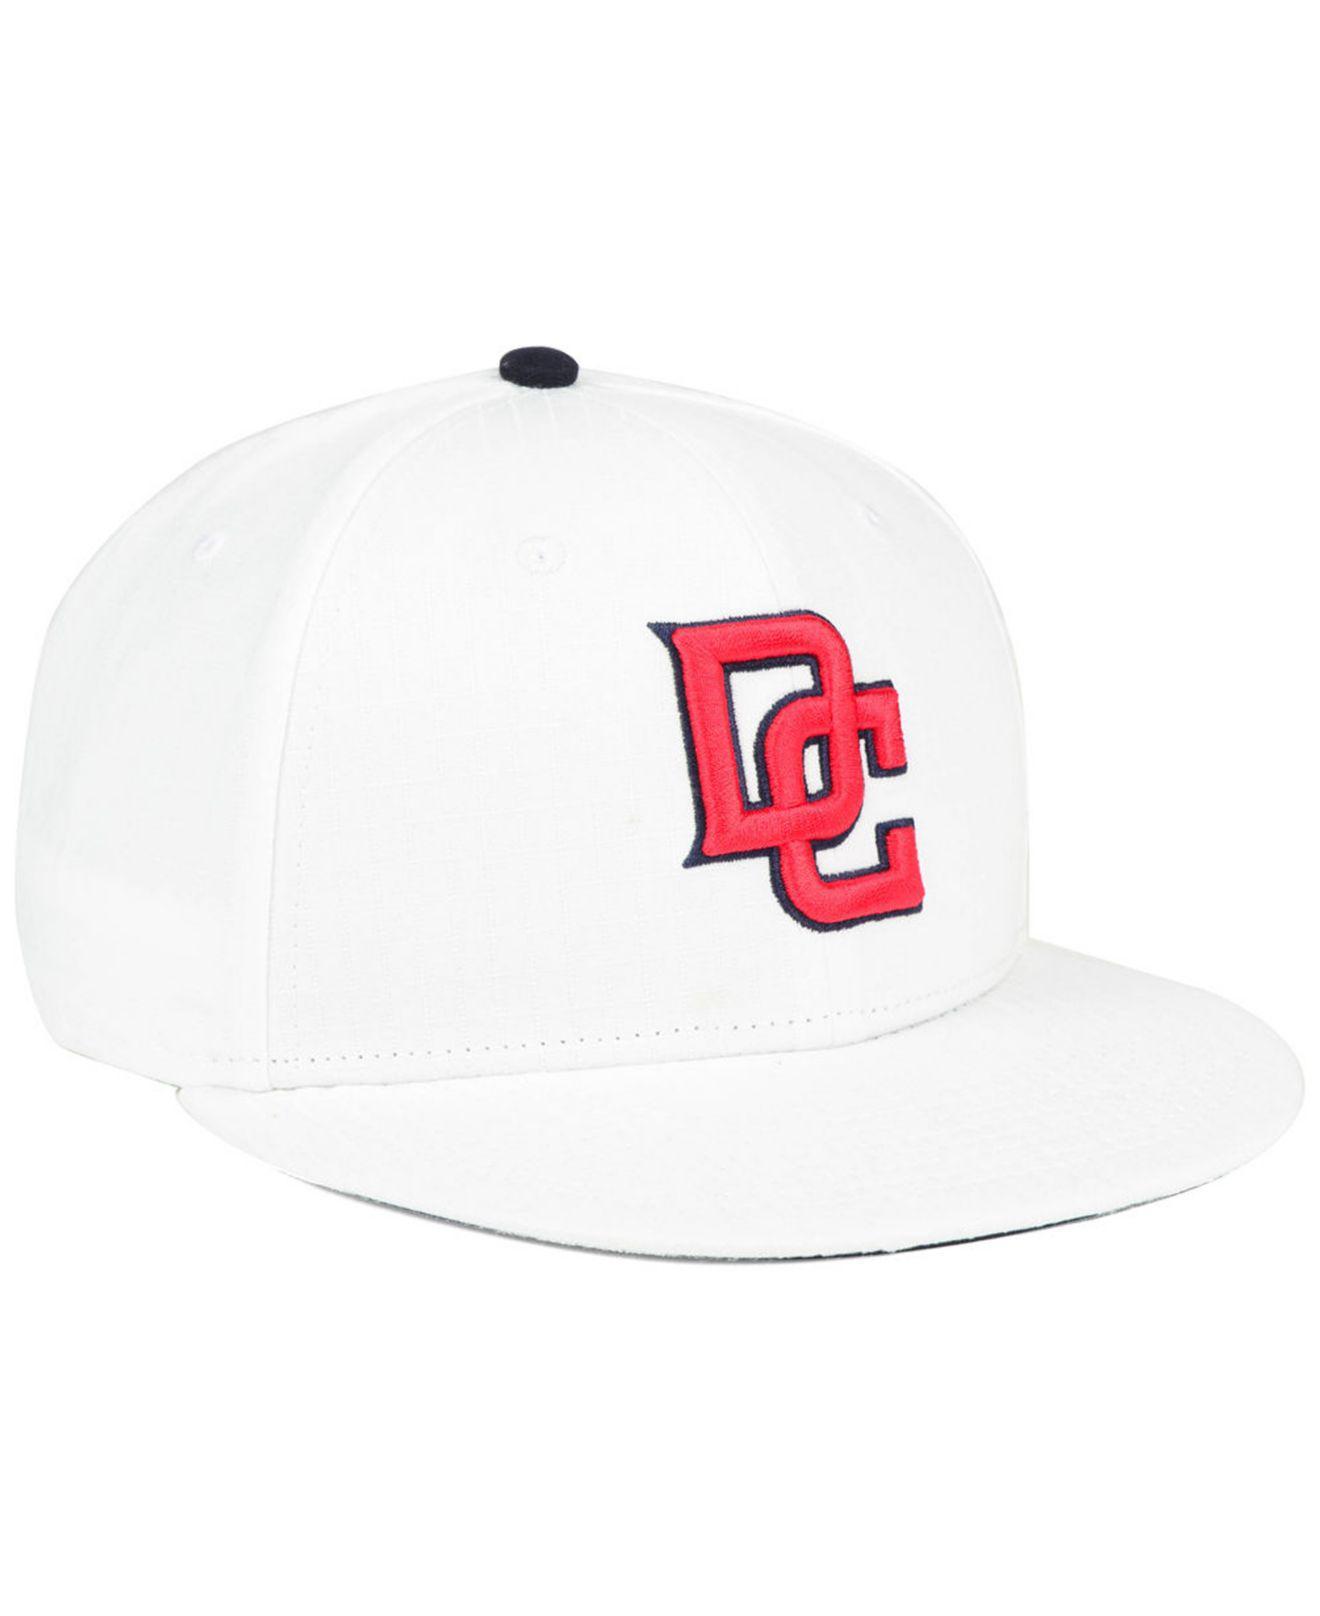 buy popular a592b 21488 Nike - Washington Nationals White Ripstop Snapback Cap for Men - Lyst. View  fullscreen